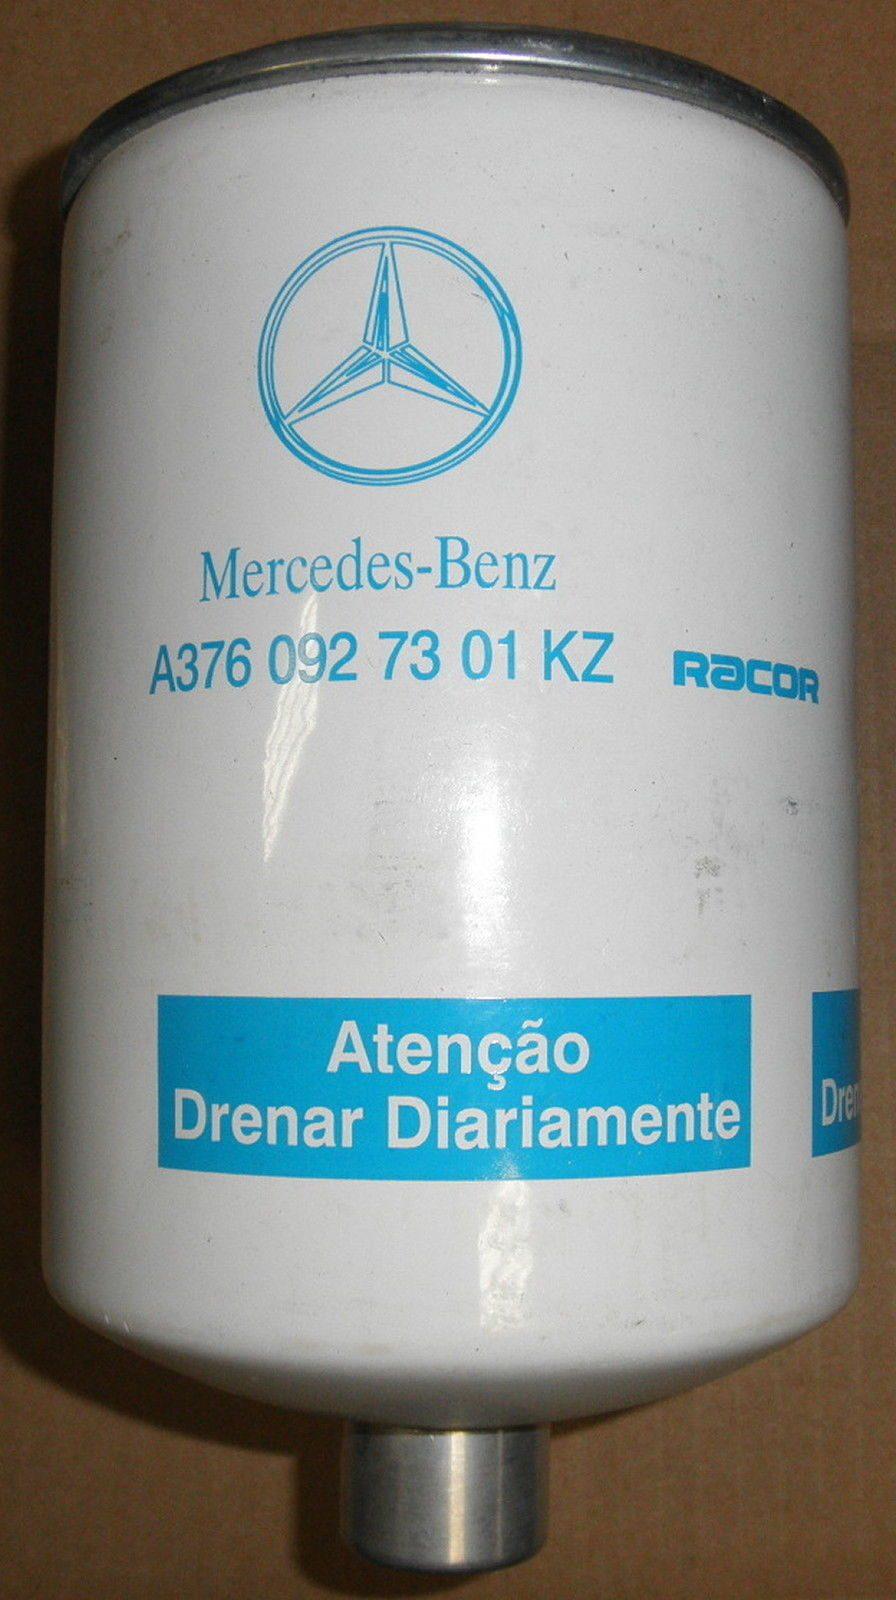 medium resolution of oem mercedes freightliner fuel filter separator a3760927301kz racor f1hz9365 a